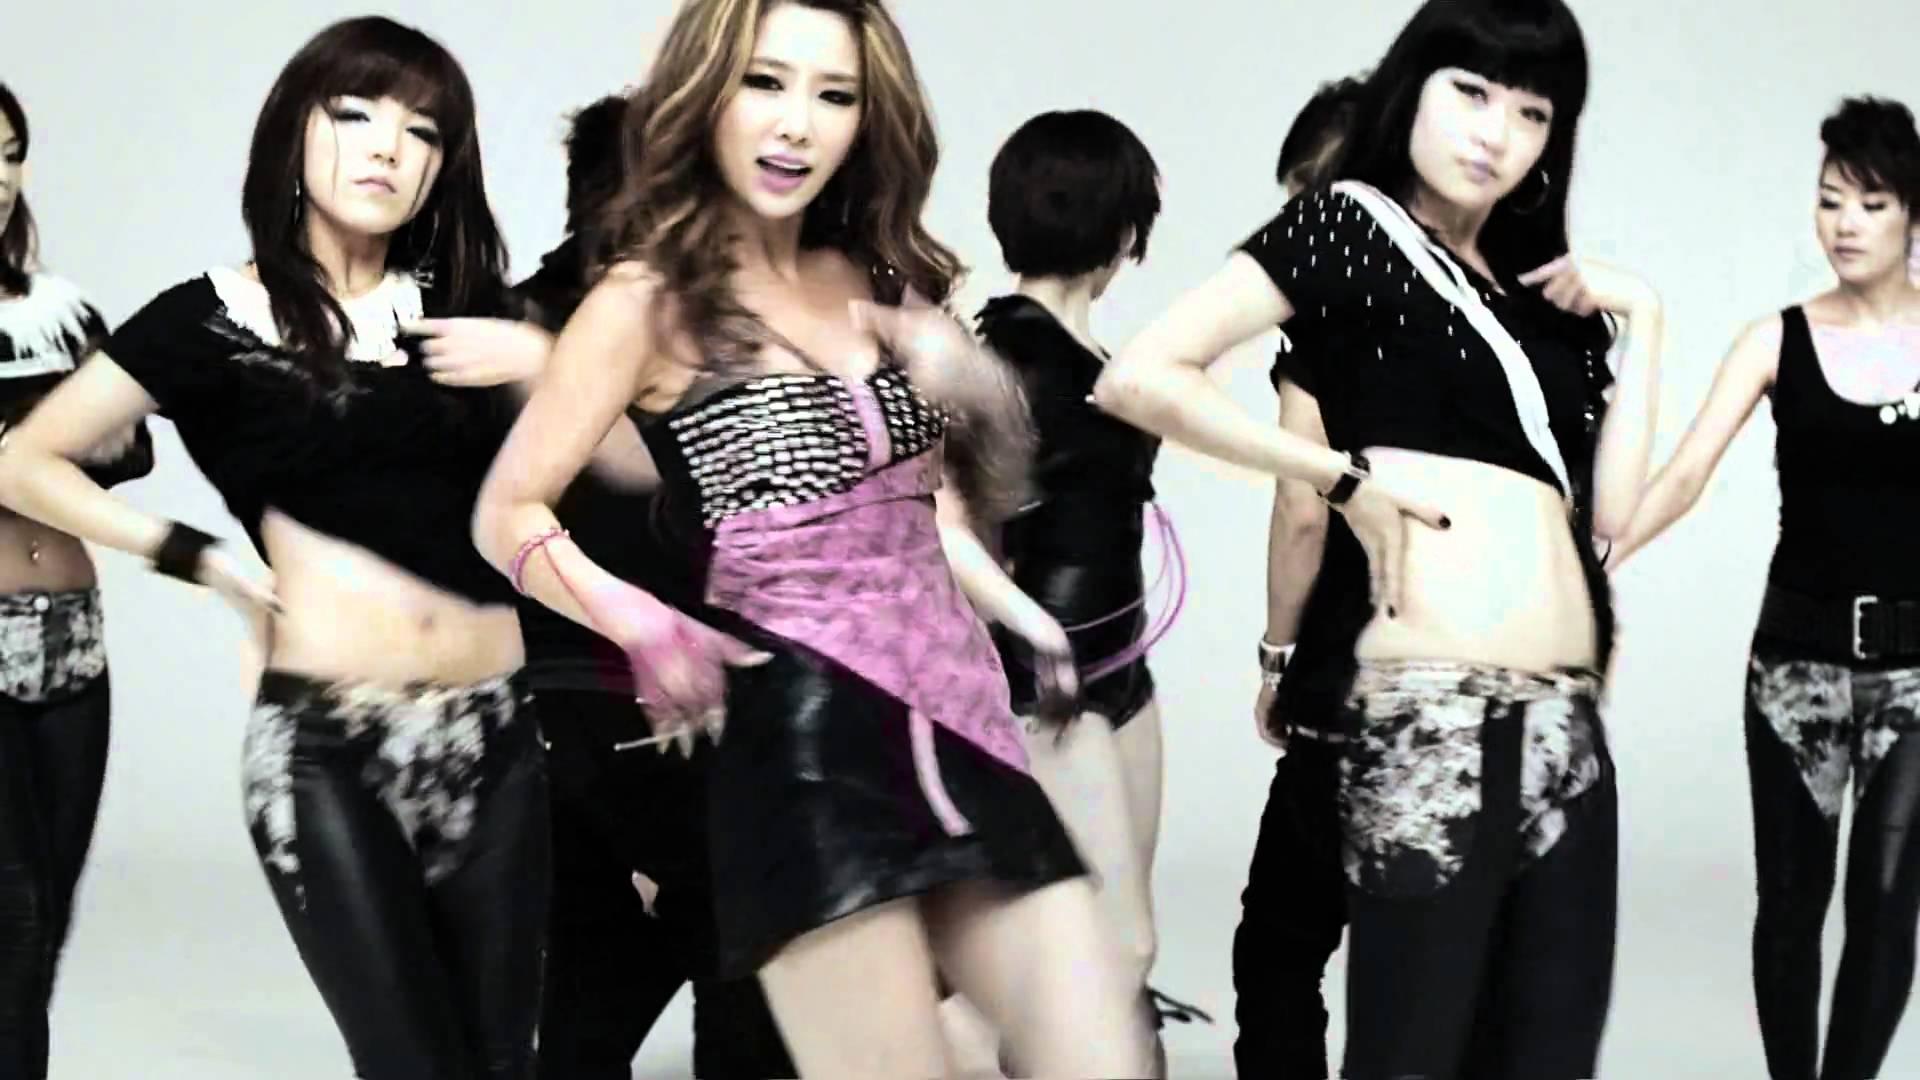 HQ Korean Girl Group Wallpapers | File 139.97Kb